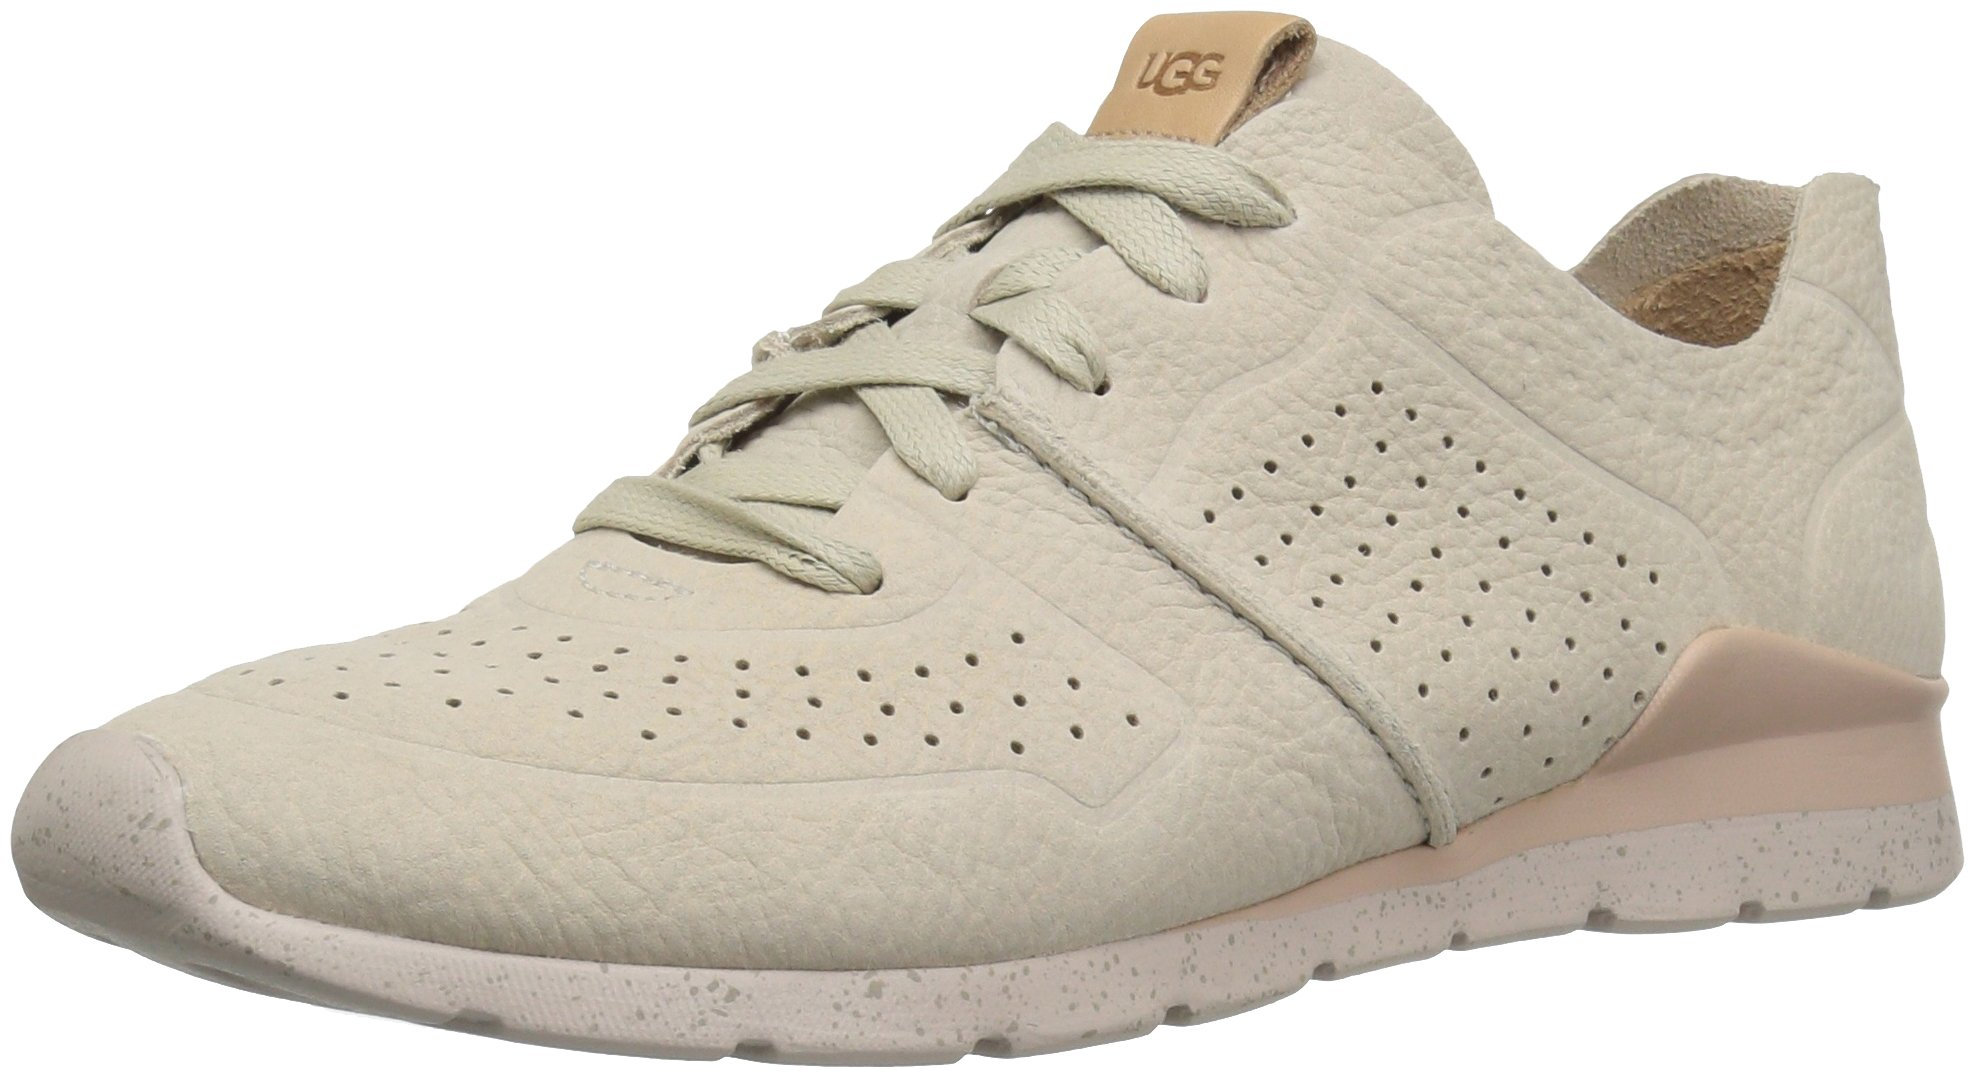 UGG Women's Tye Fashion Sneaker, Ceramic, 9.5 US/9.5 B US